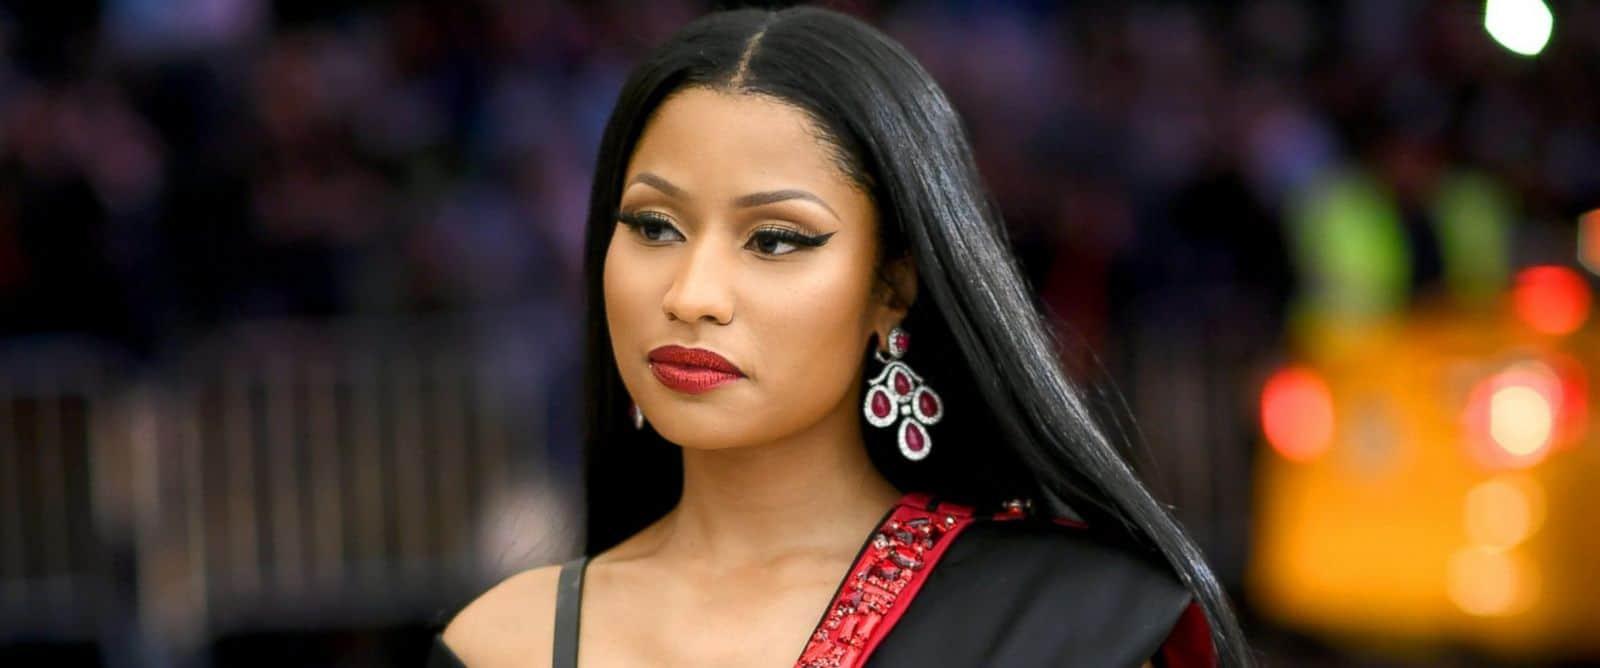 Nicki Minaj, Money, Fans, Twitter